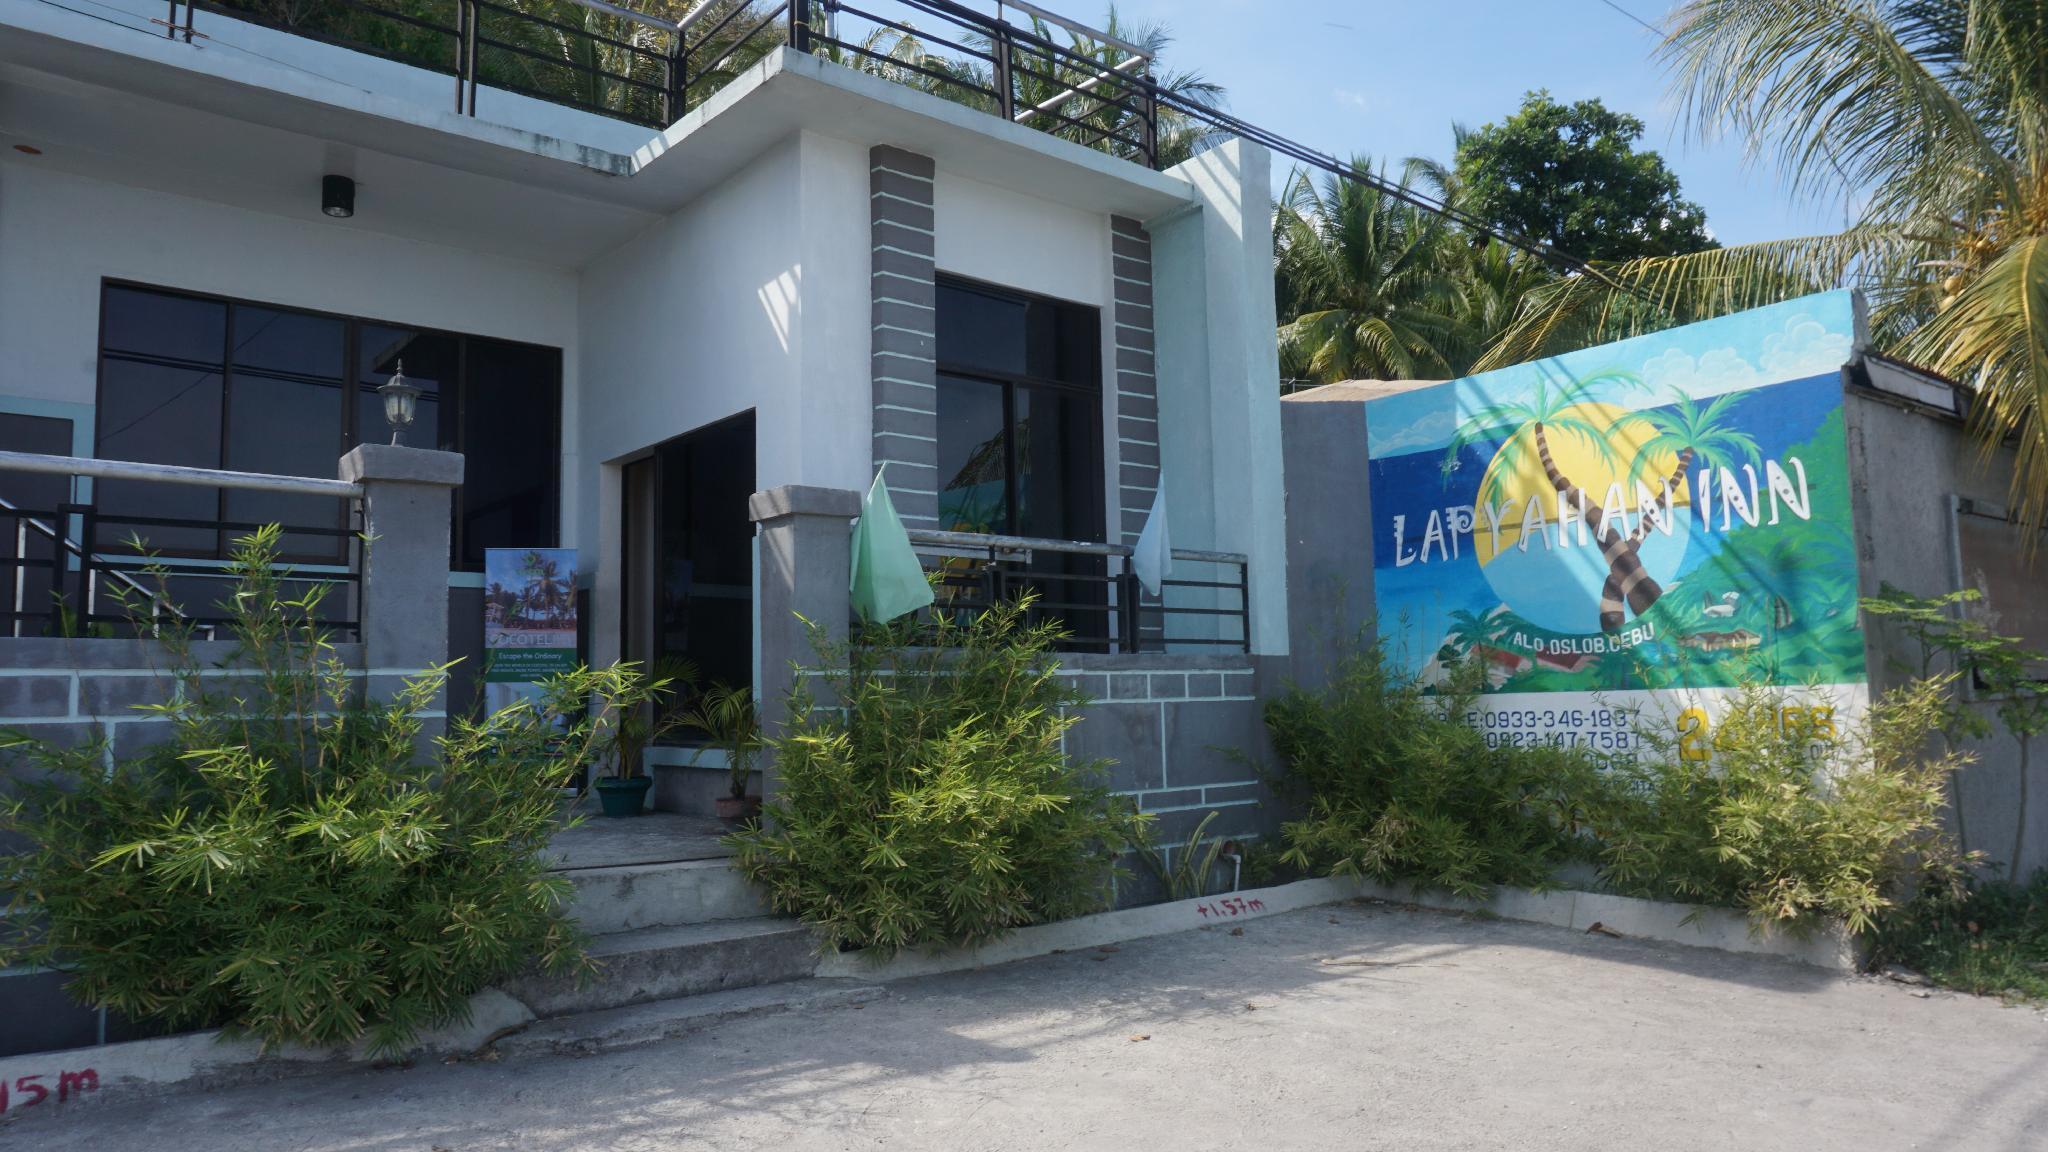 Cocotel Rooms Lapyahan Inn